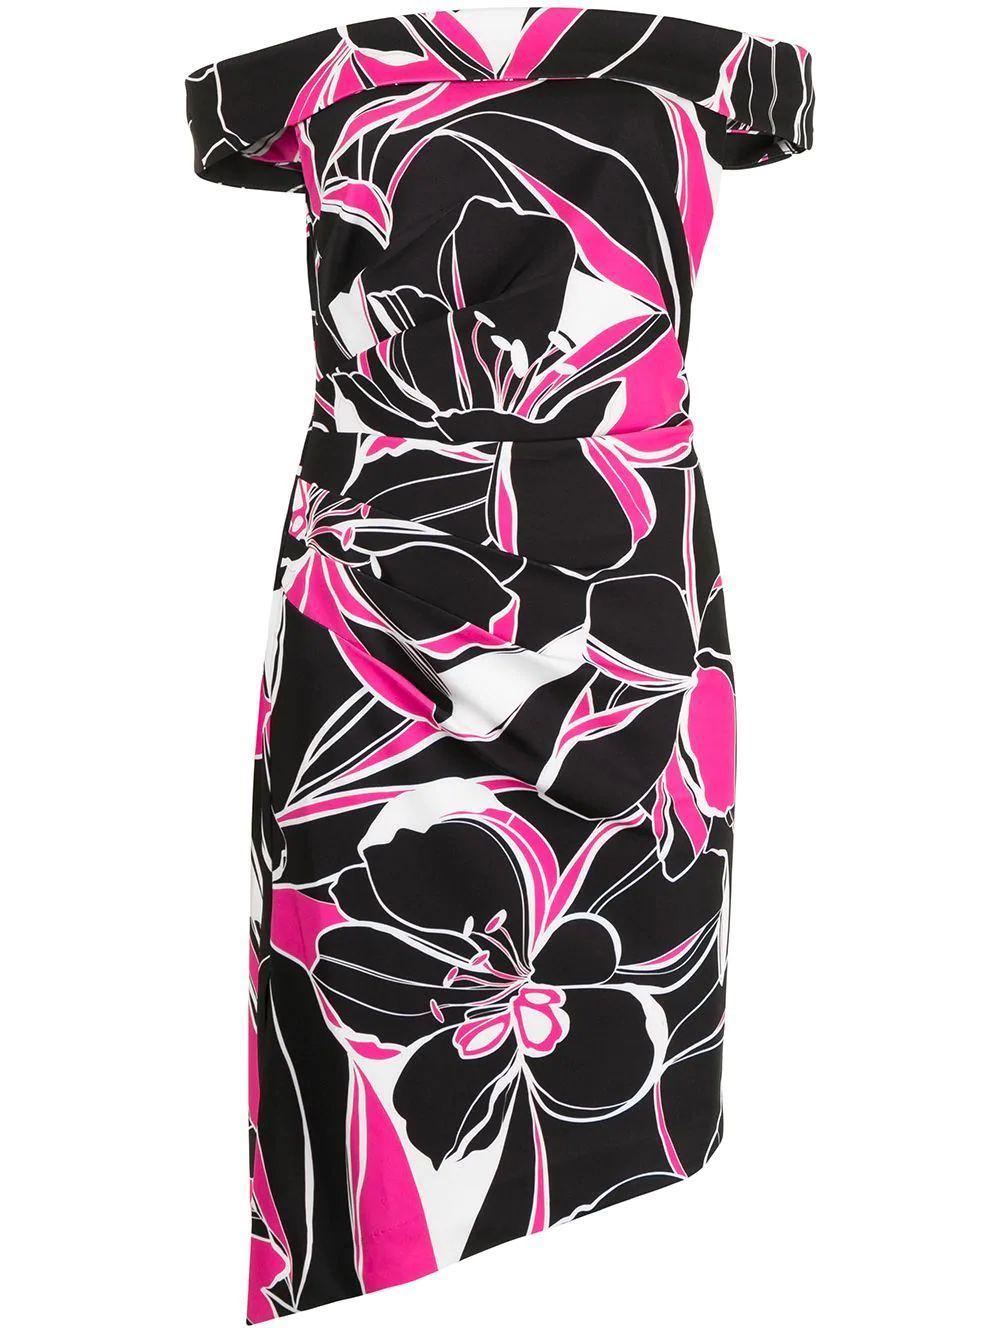 Ally Stencil Floral Dress